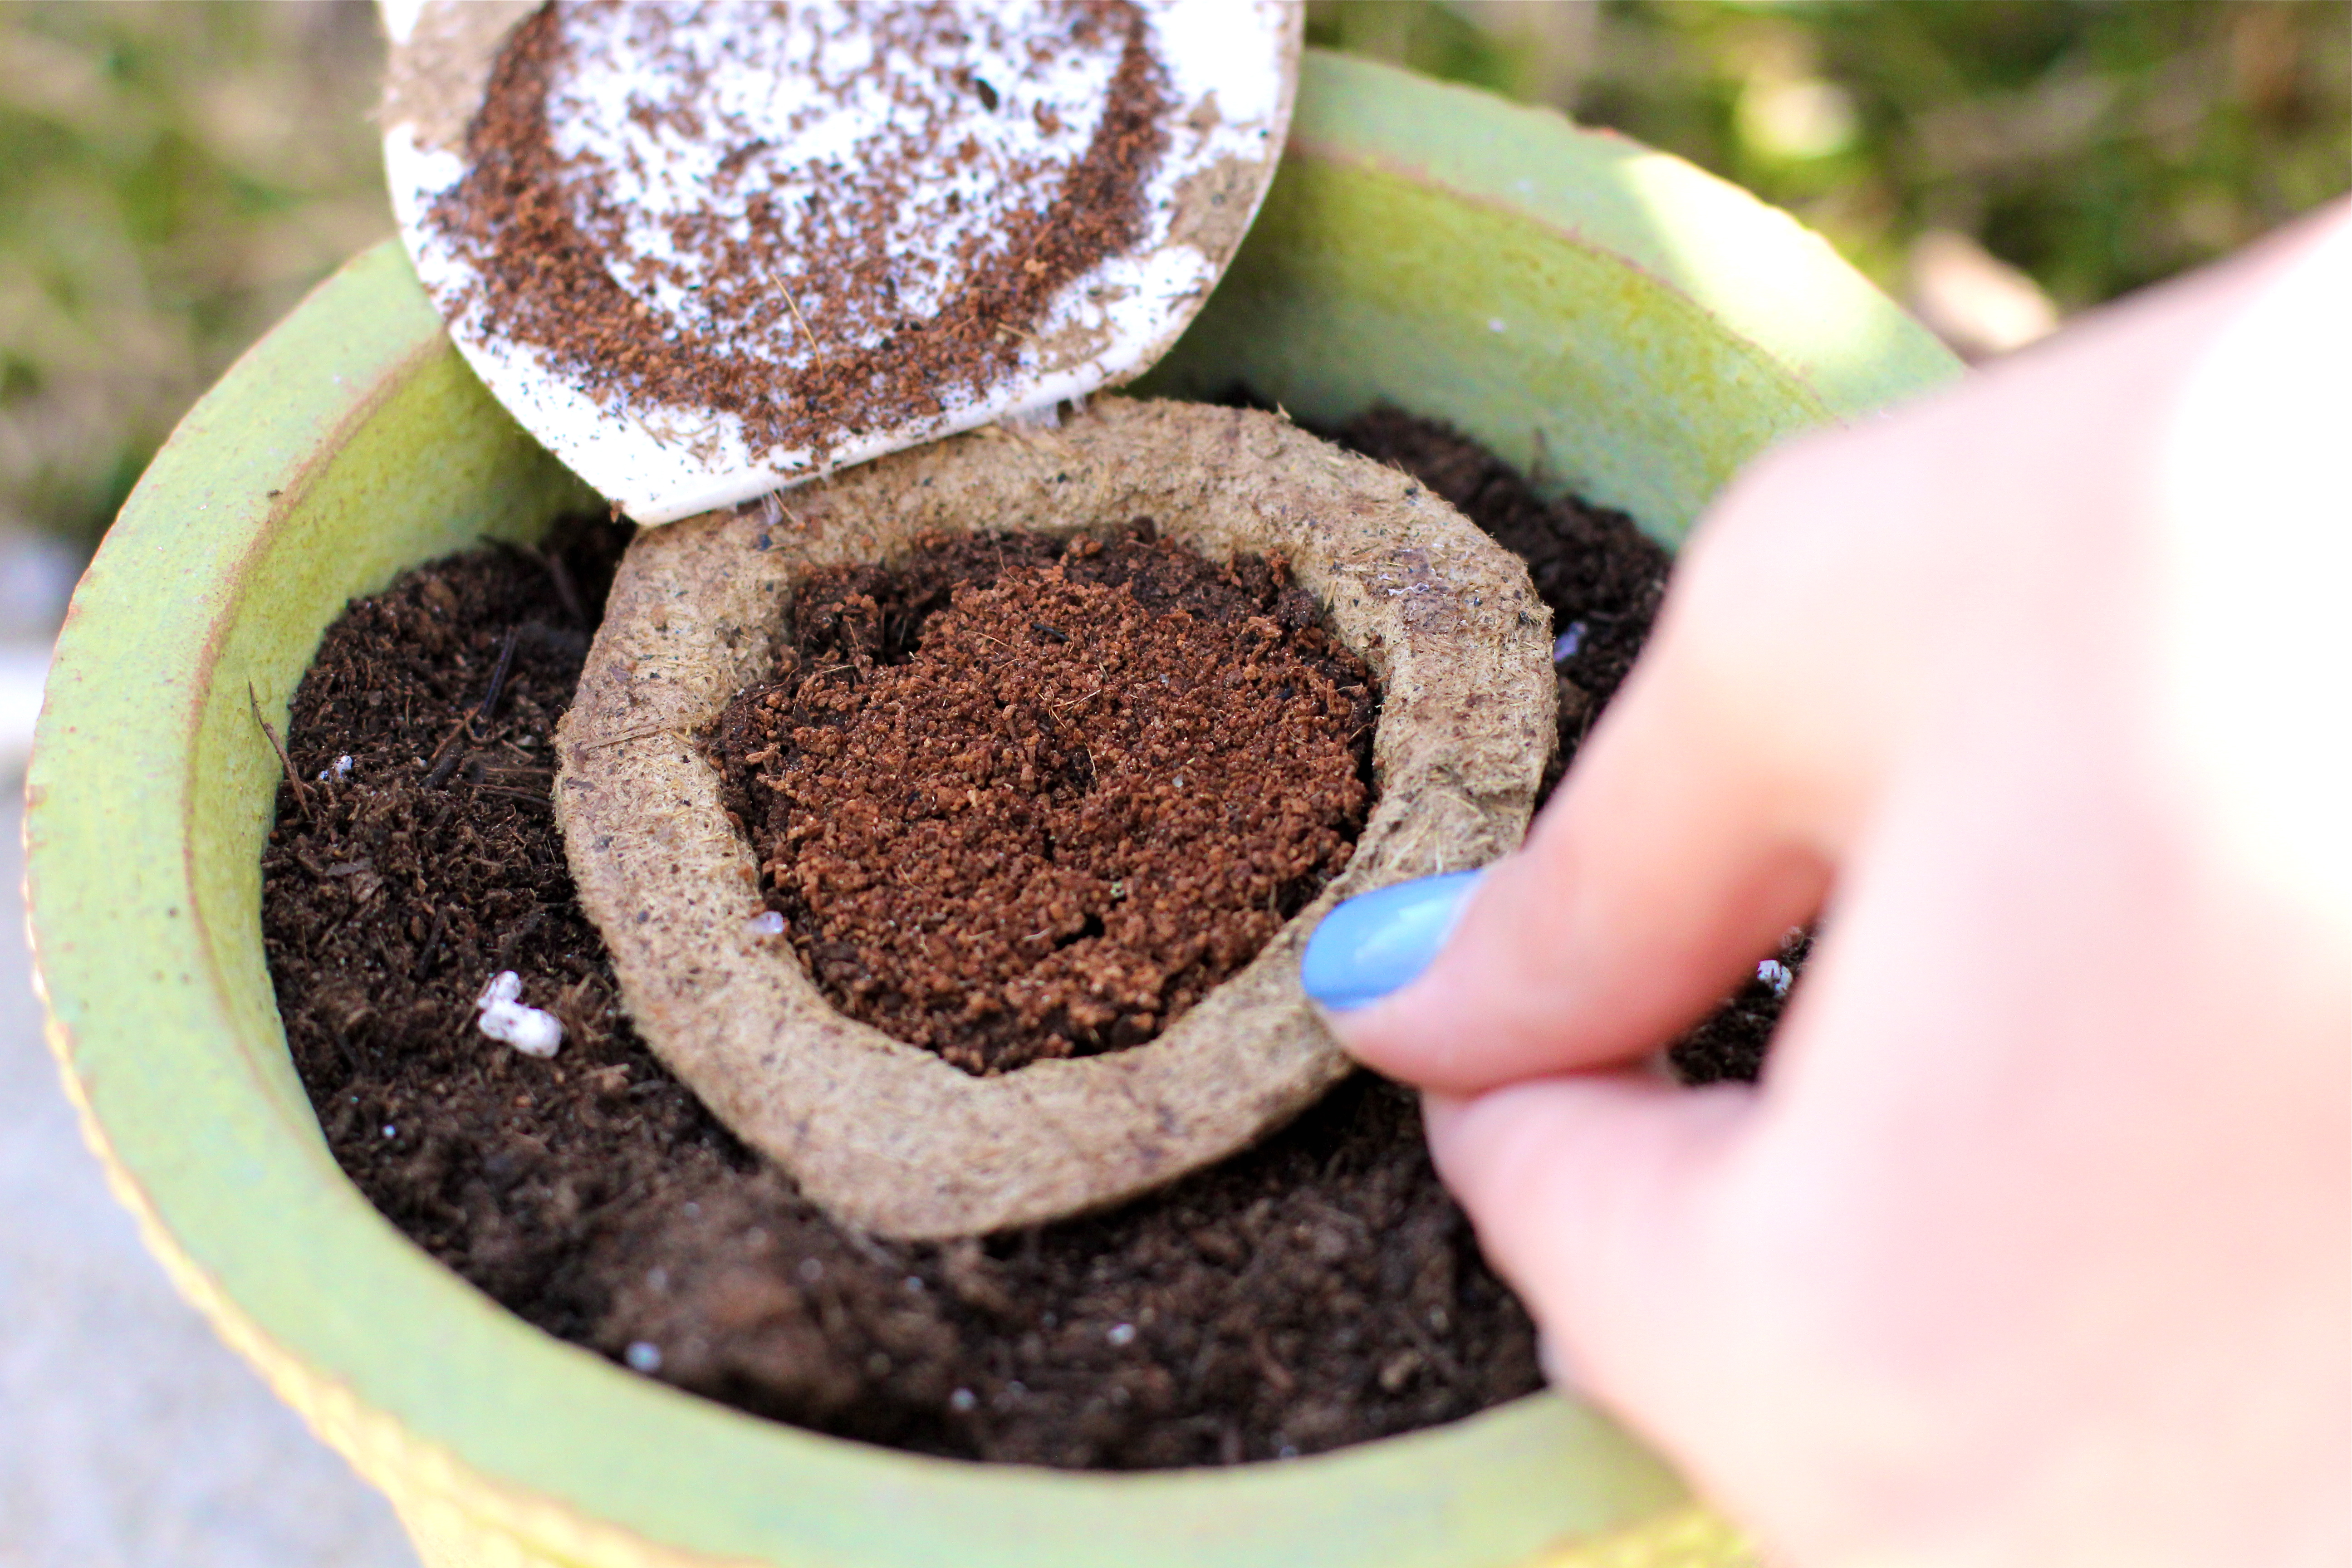 how-to-start-a-garden-girl-about-columbus